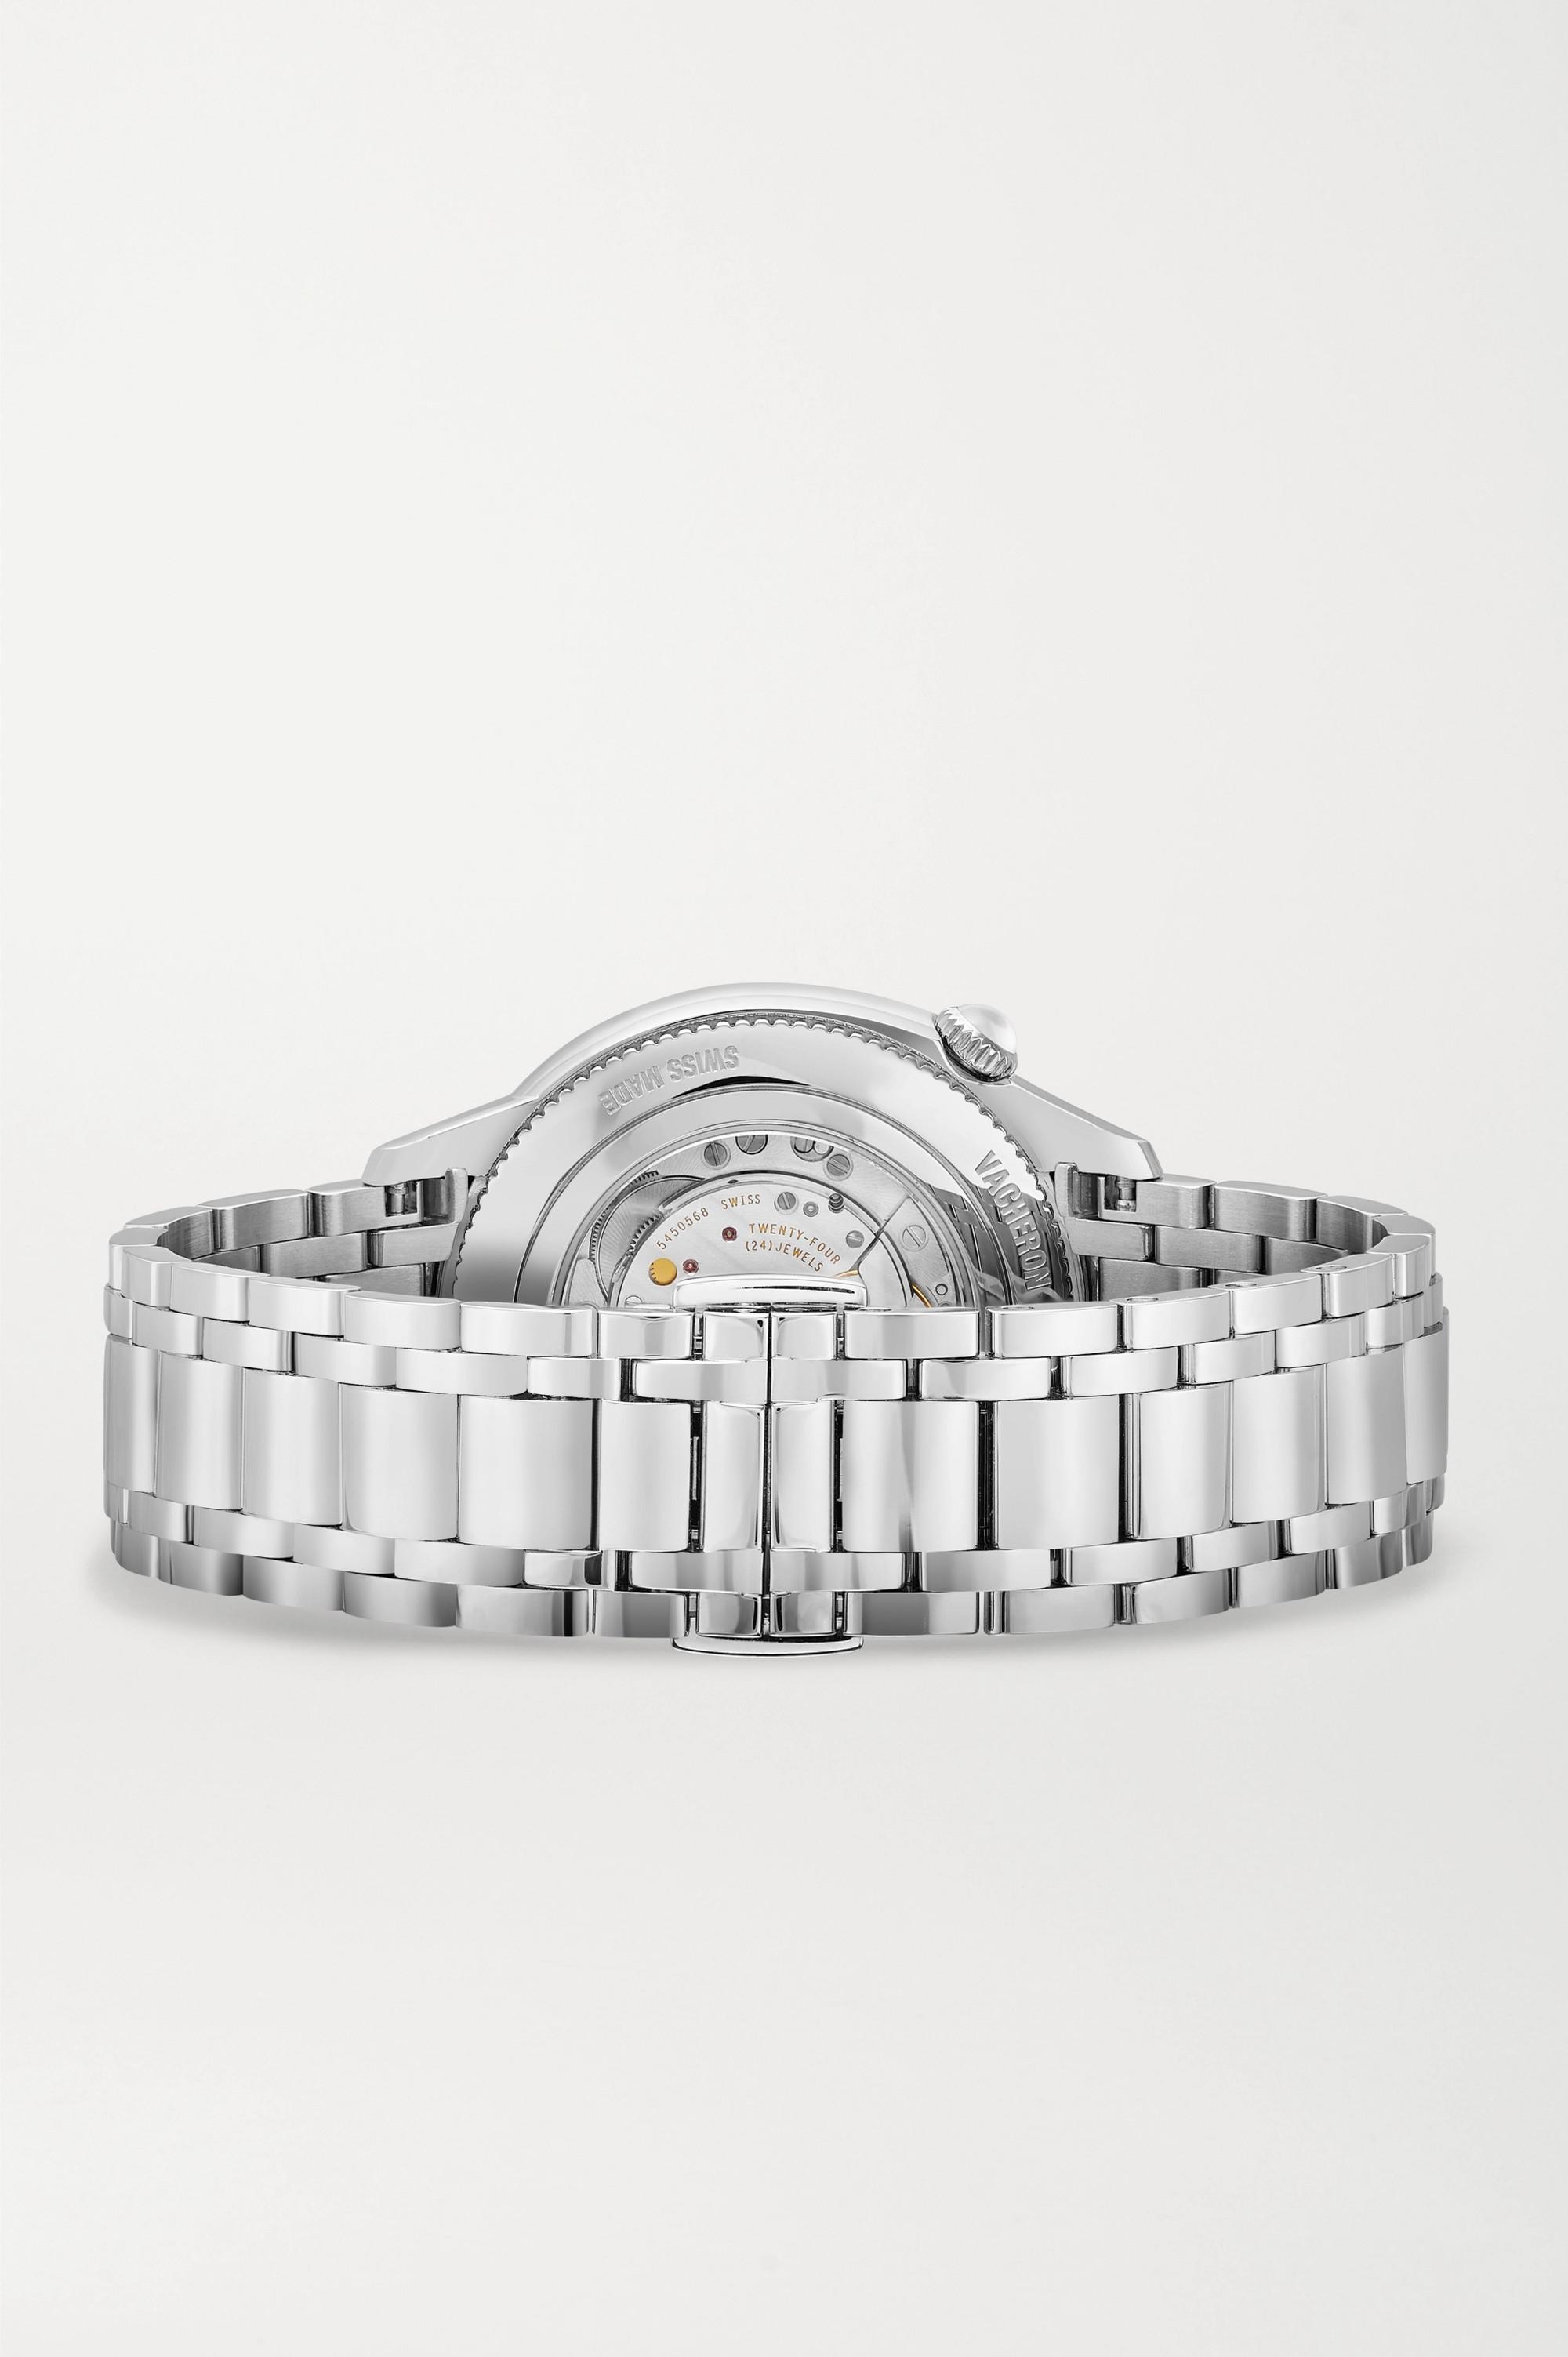 Vacheron Constantin Egérie Automatic 35mm stainless steel and diamond watch